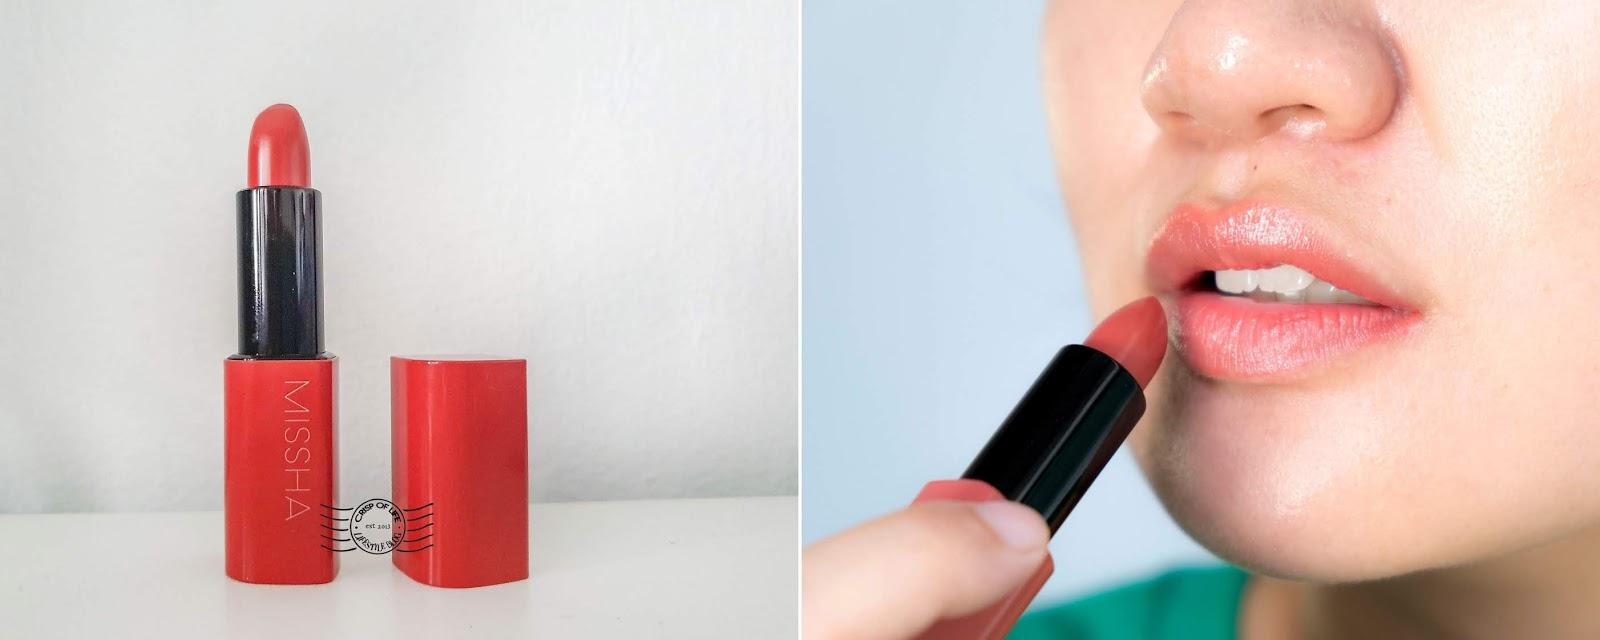 Espoir Missha Clio Korea Lipsticks Souvenirs by Hubby